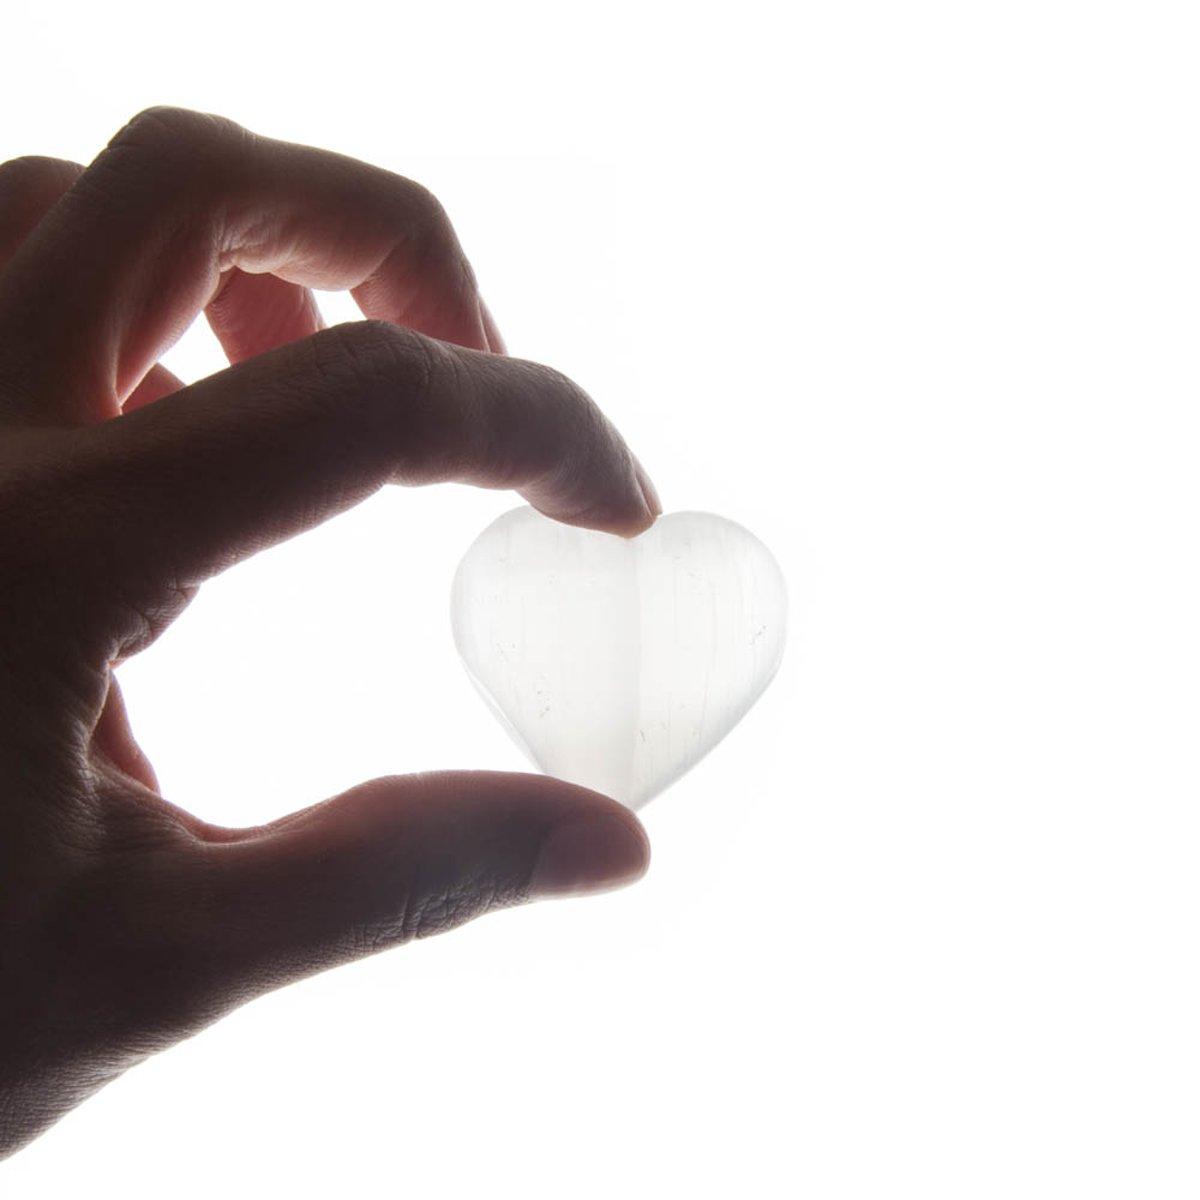 Hart knuffelstenen Seleniet - wit - Per stuk kopen